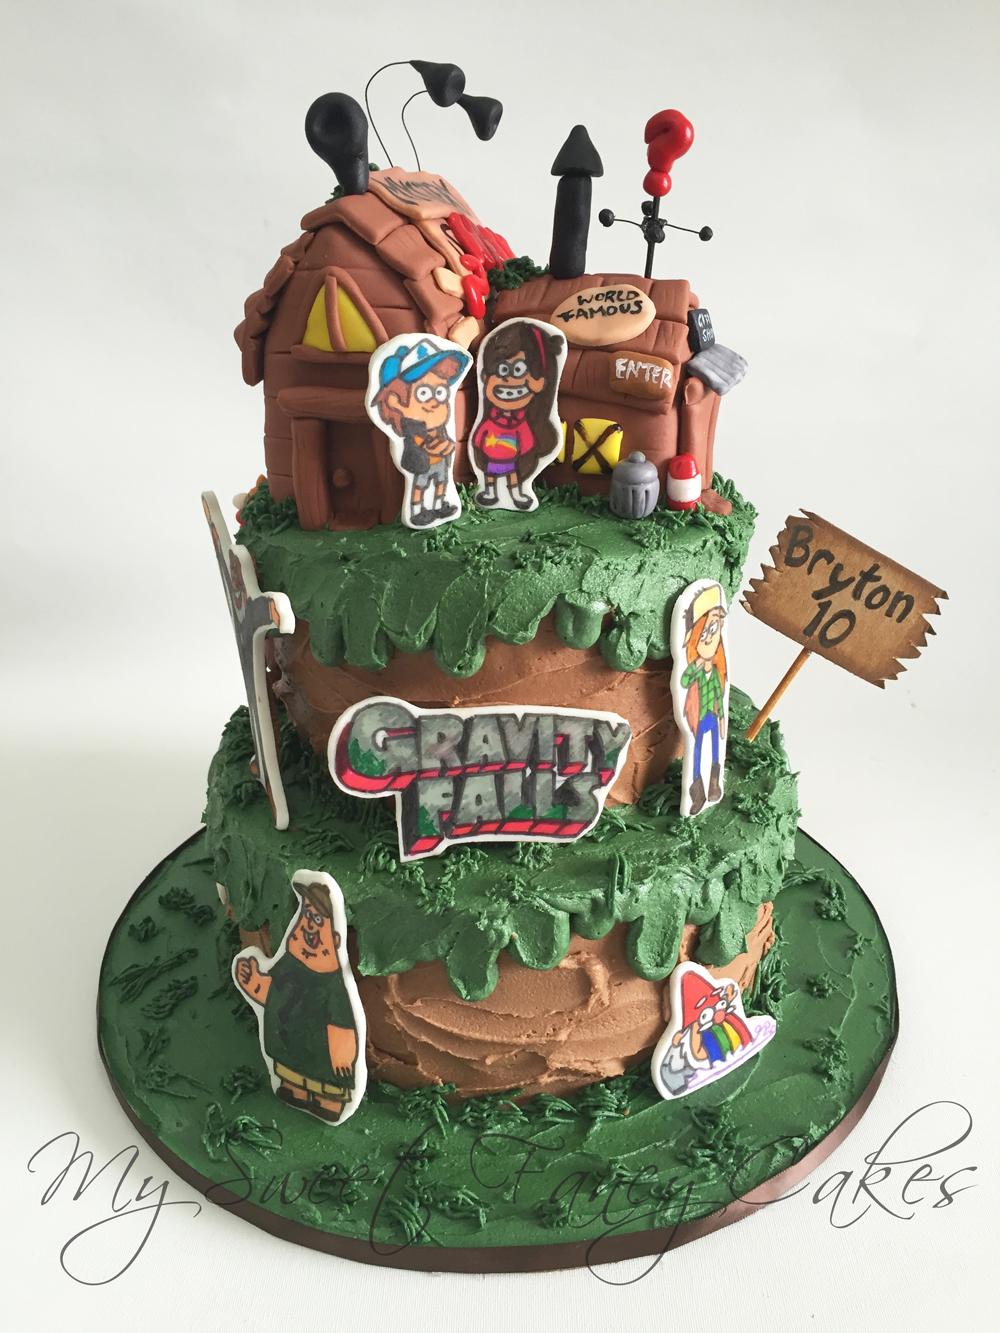 Gravity Cake Chack Falls